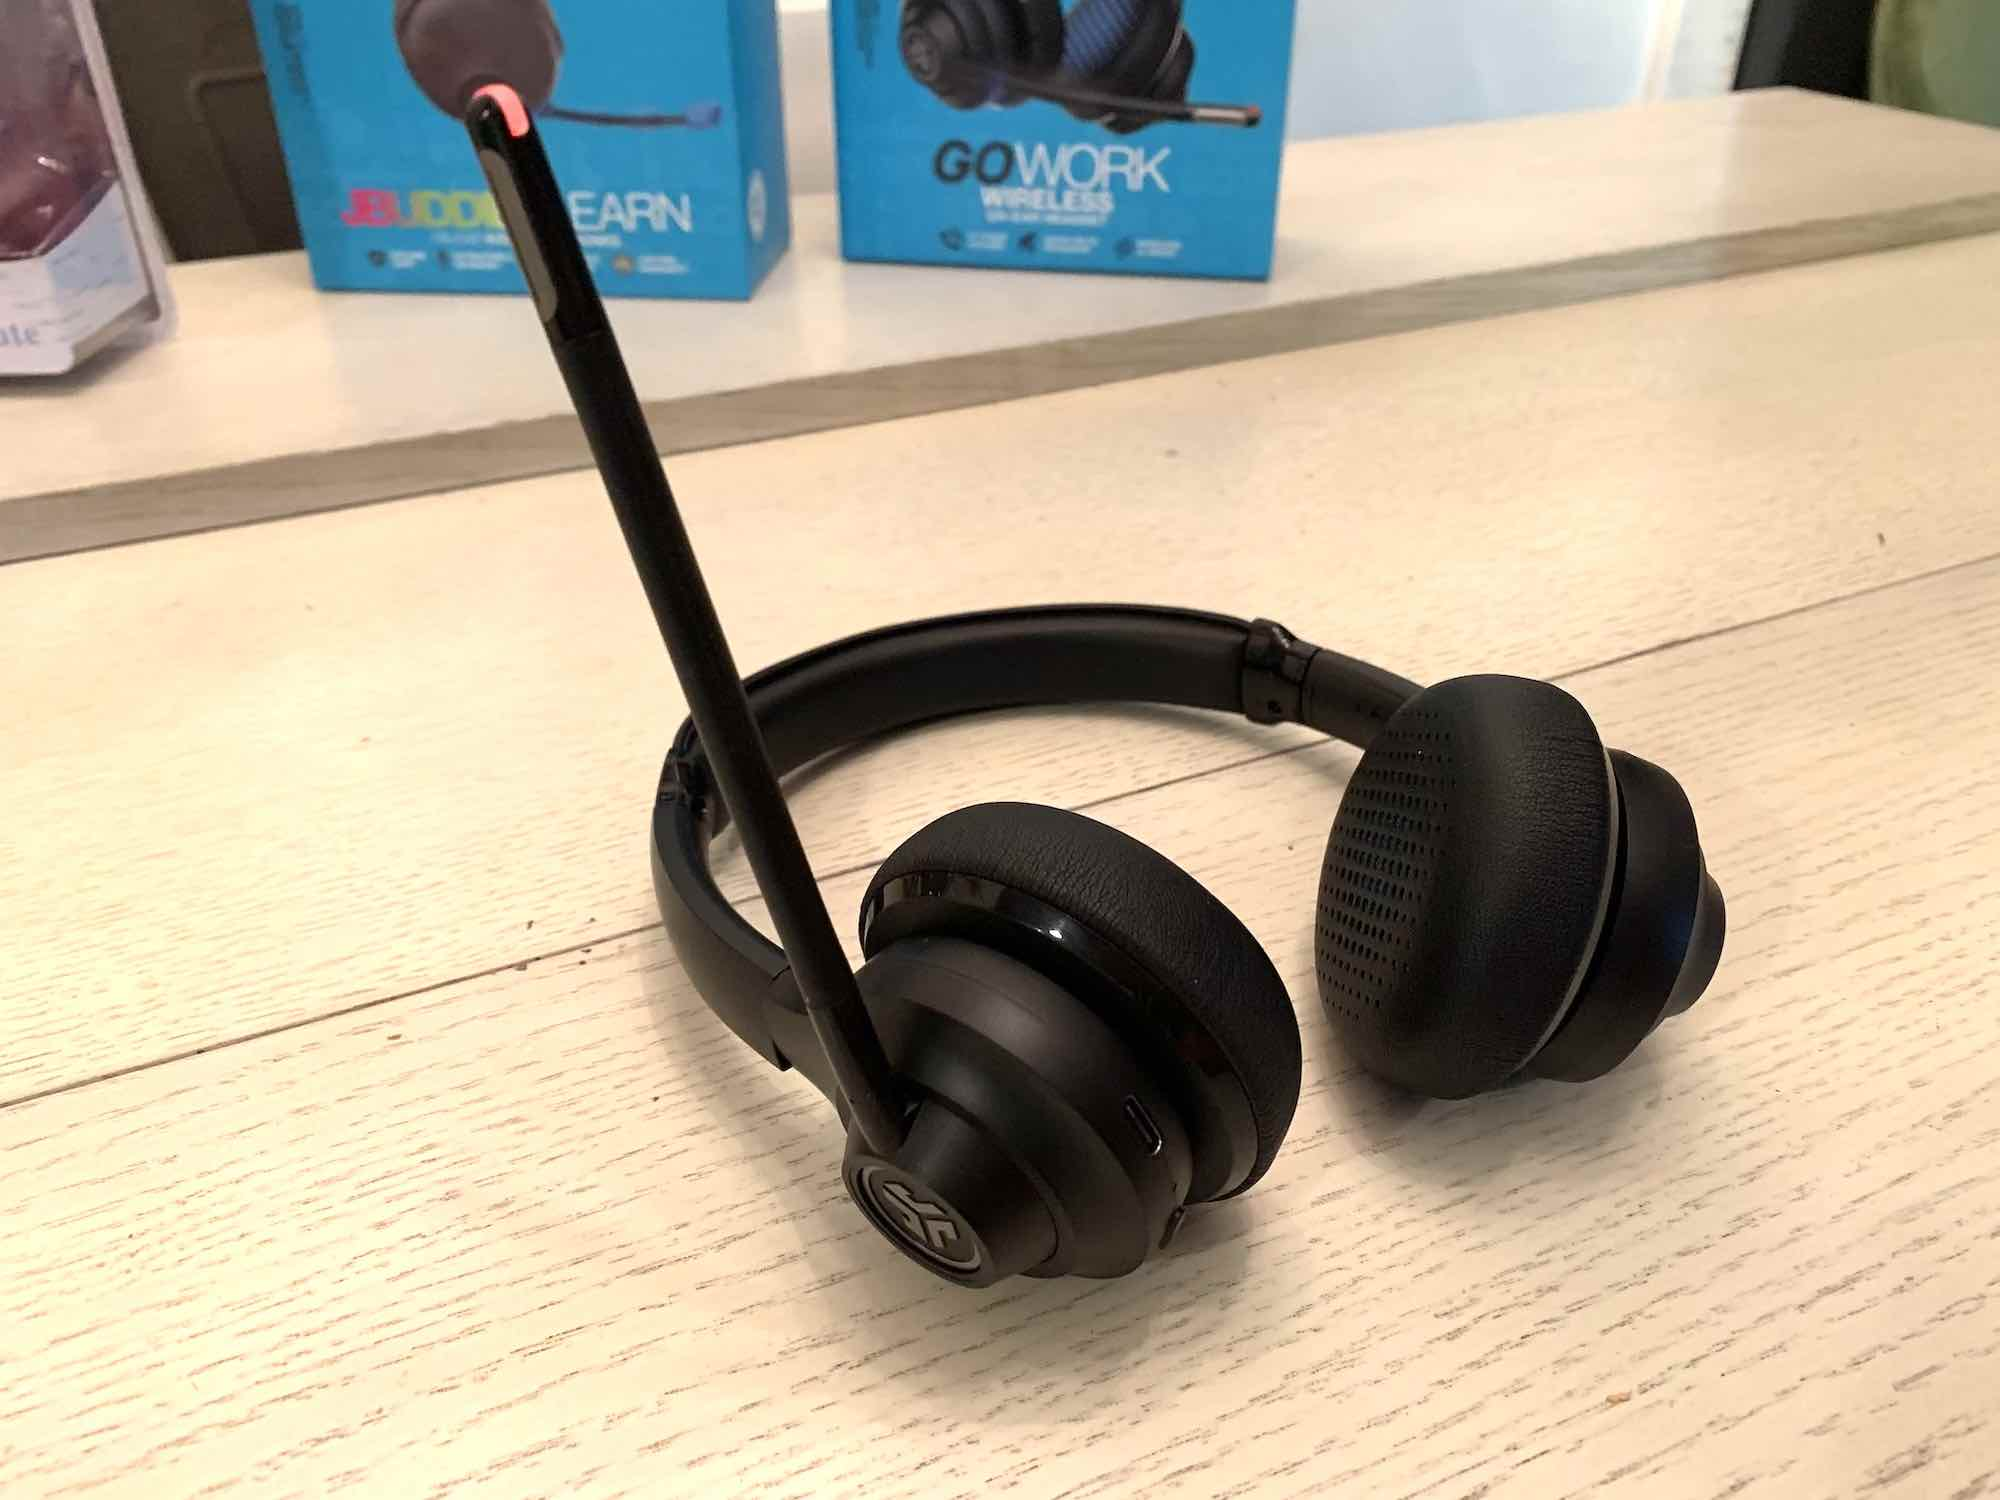 JLAB GoWork headphones